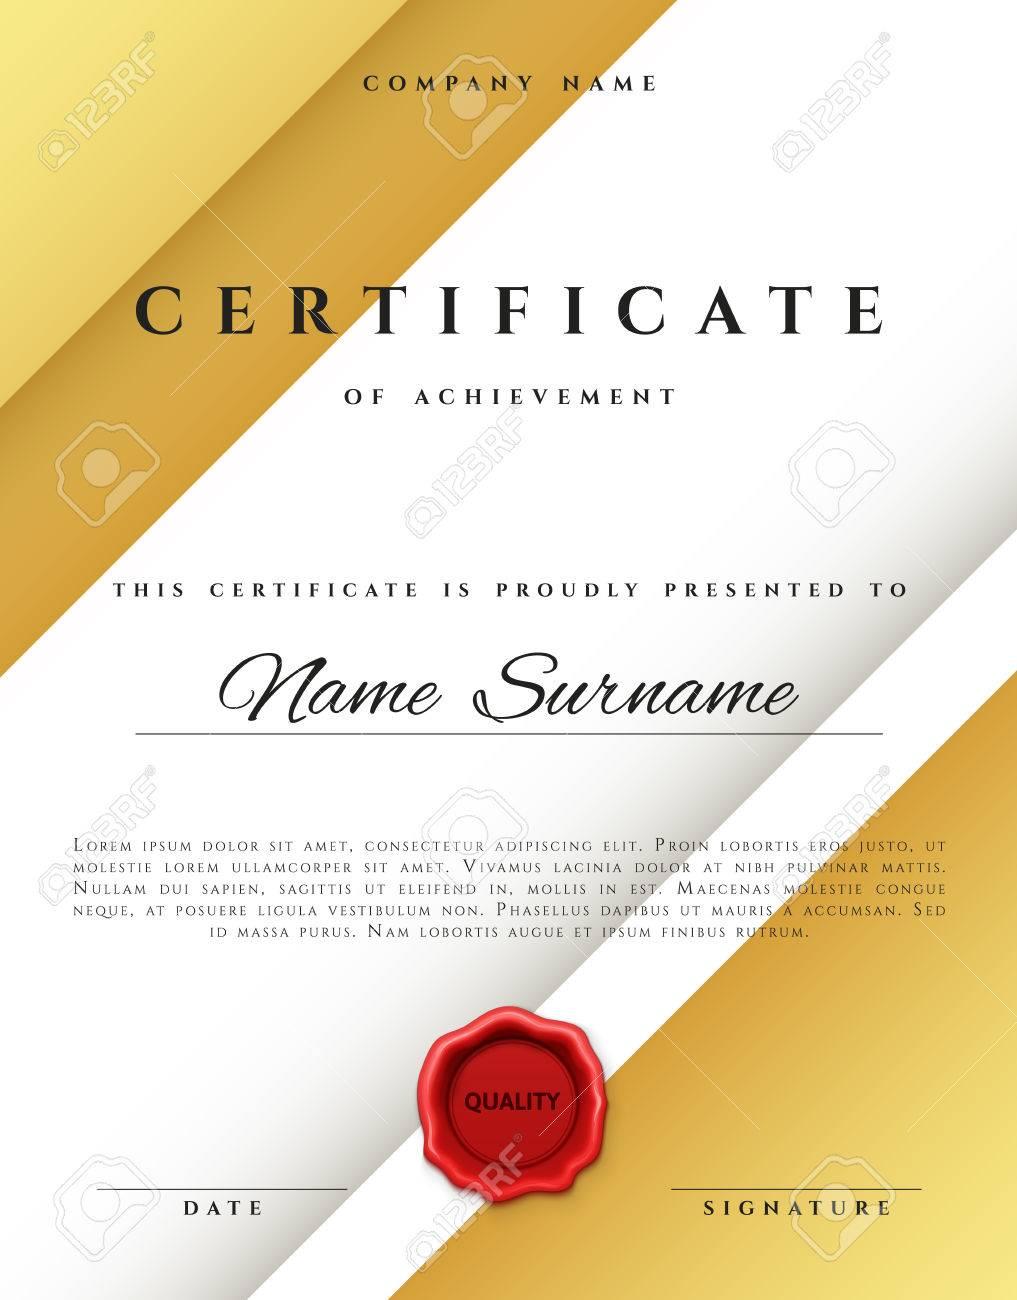 template certificate design in gold color award certificate